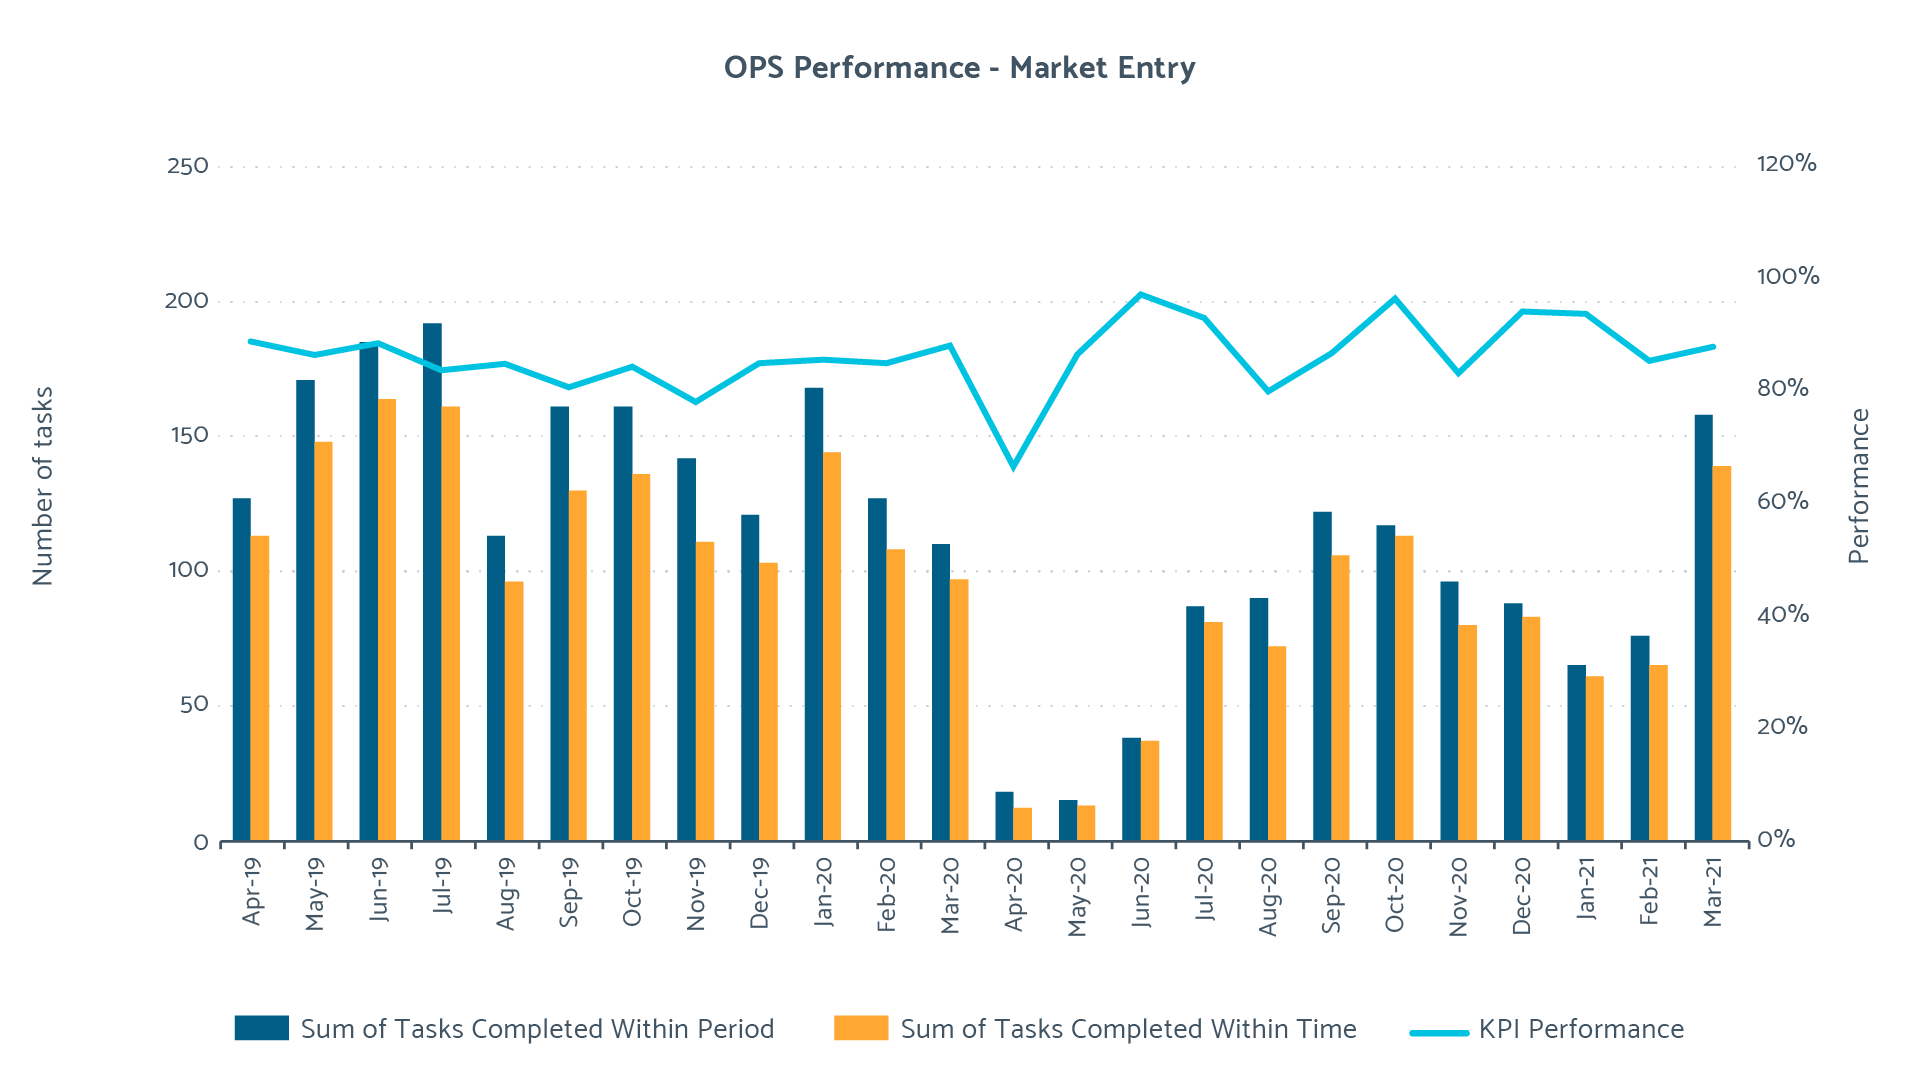 2020/21 Market Entry Performance